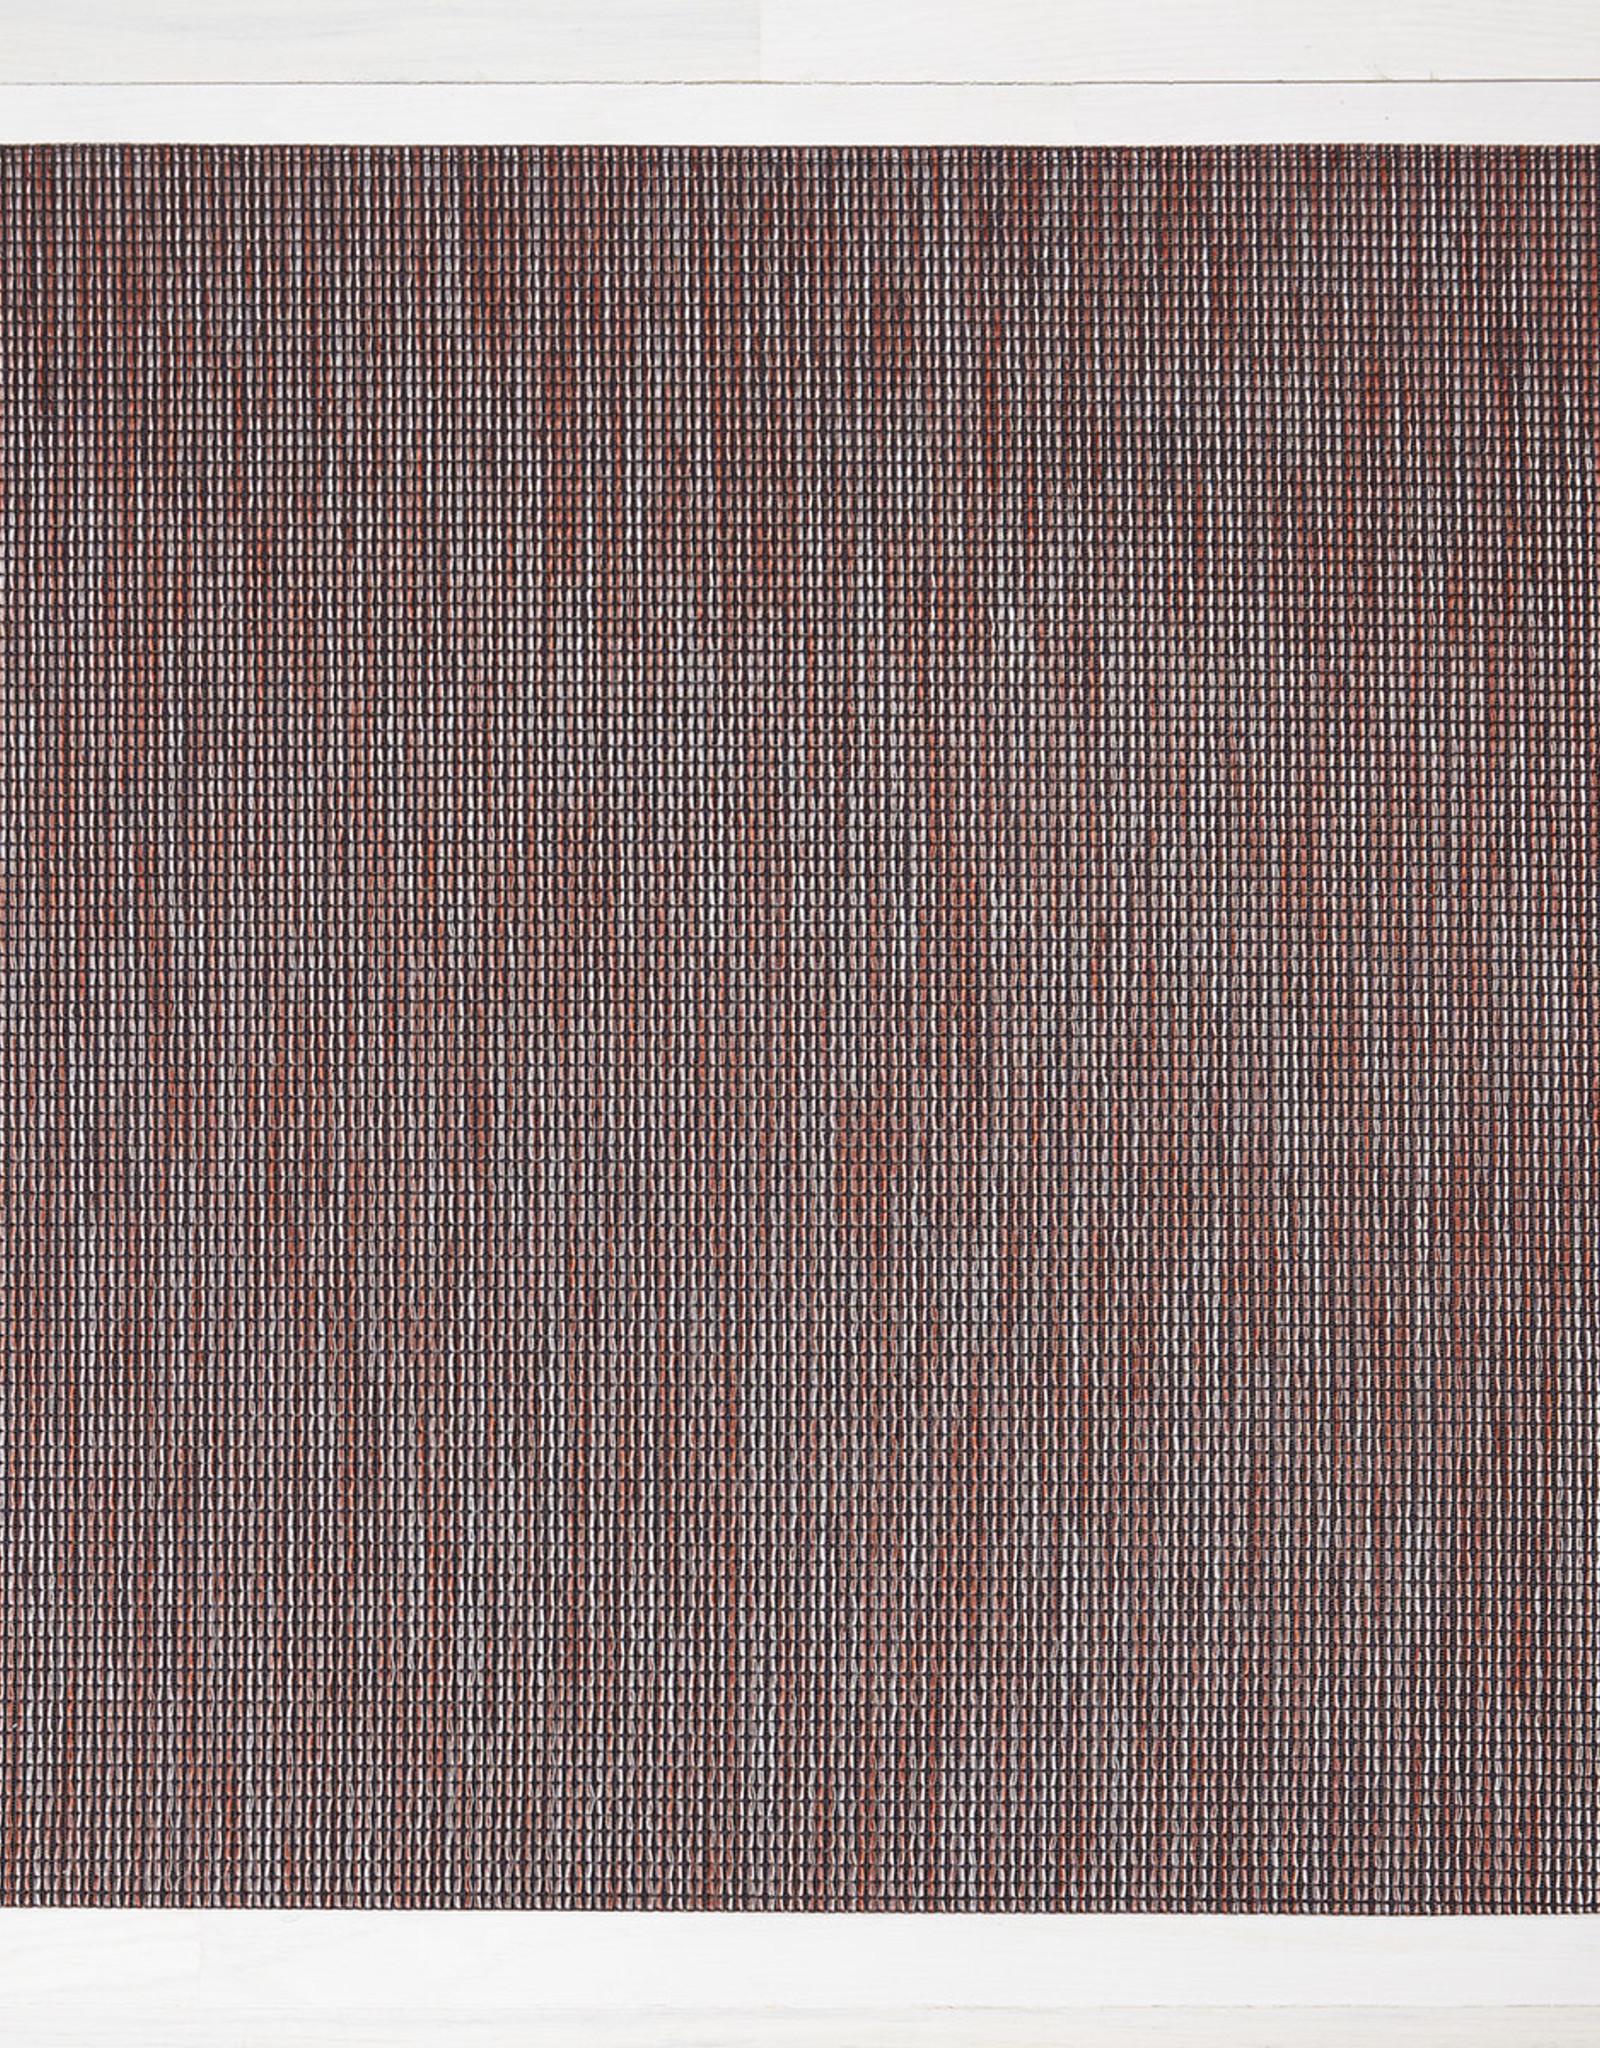 Chilewich Wabi Sabi Floormat 35 x 48, SIENNA